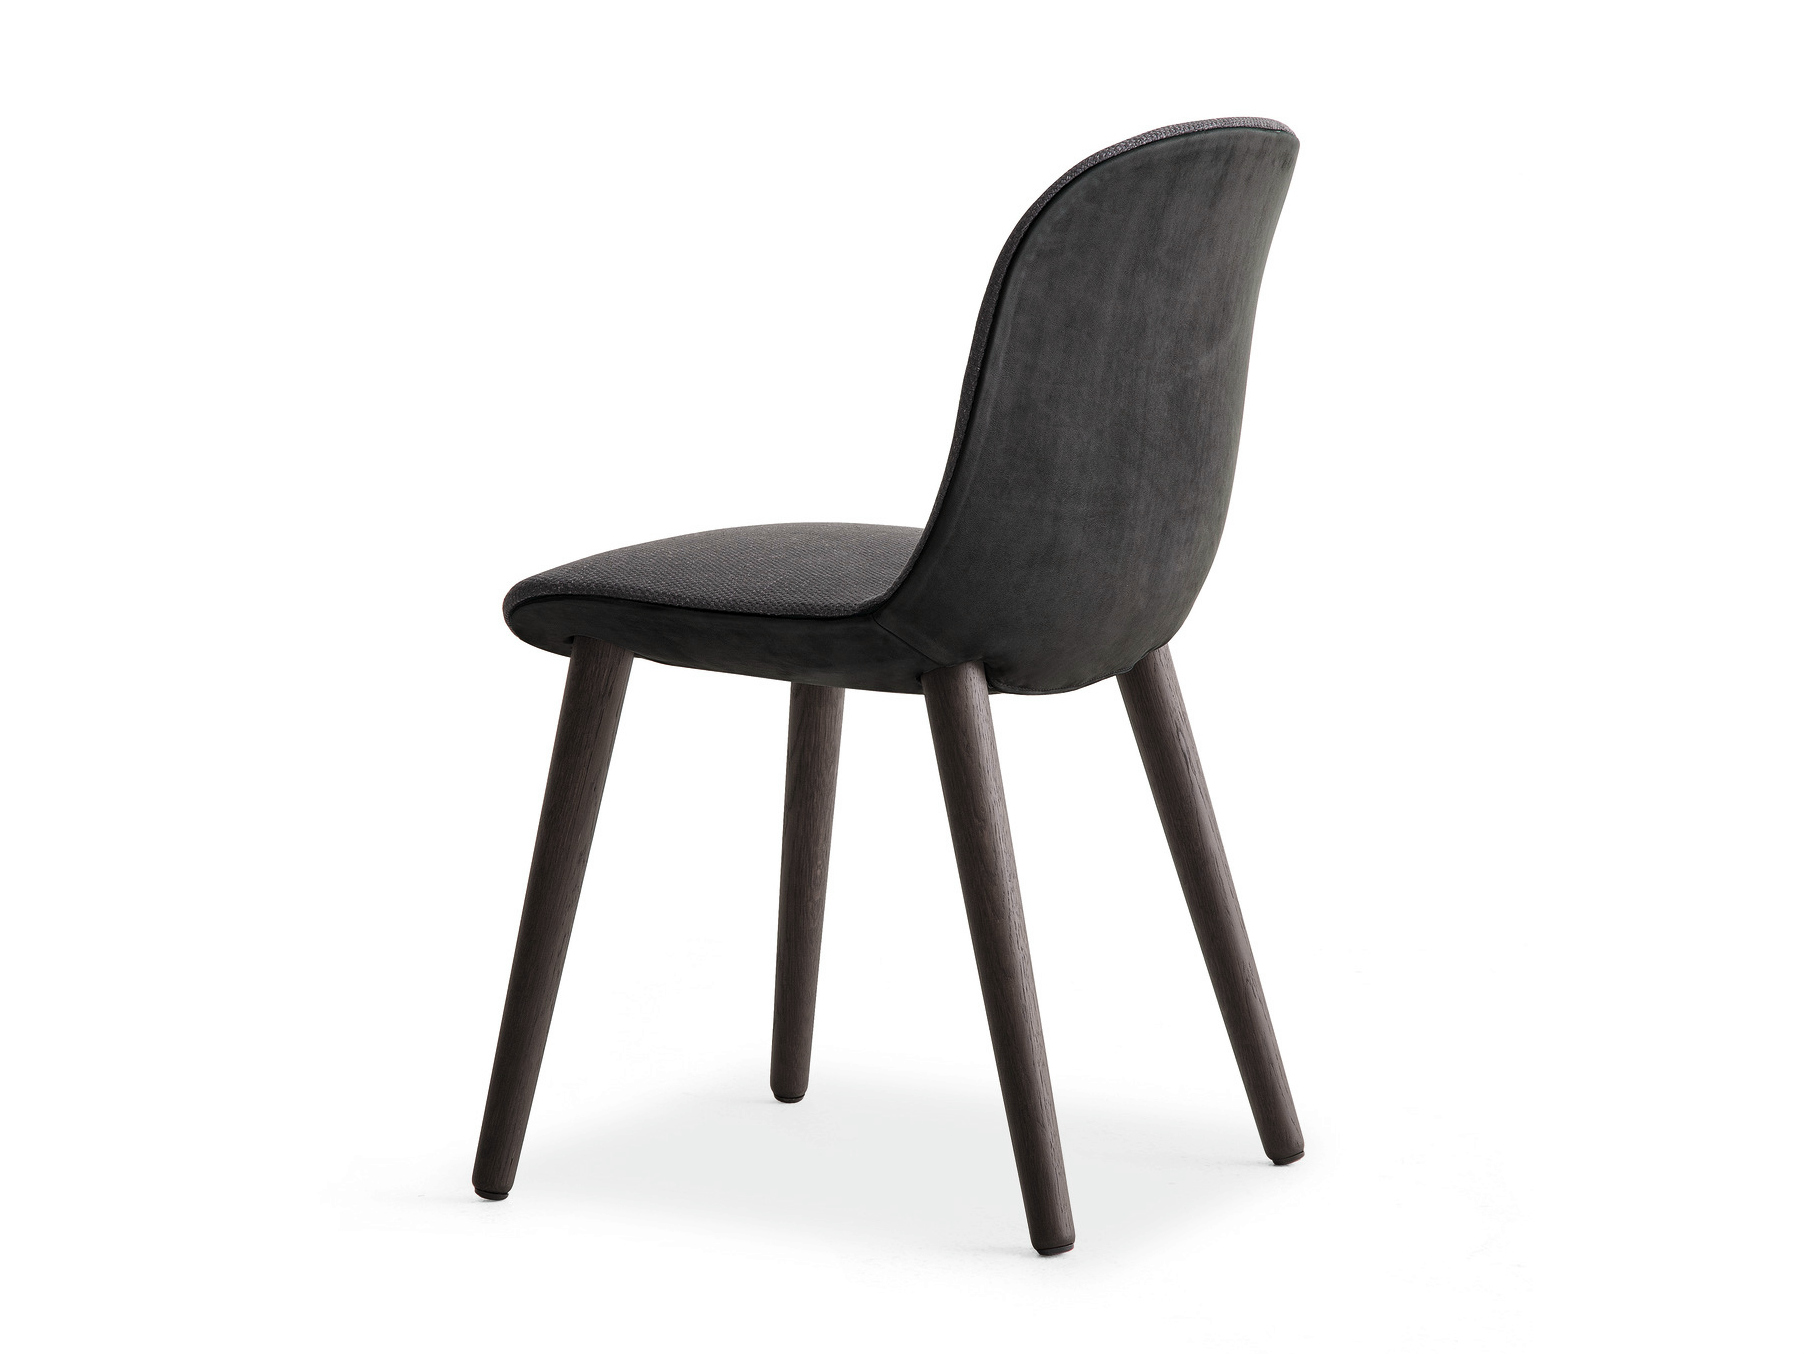 Sedia imbottita in tessuto mad dinning chair poliform for Poliform sedie